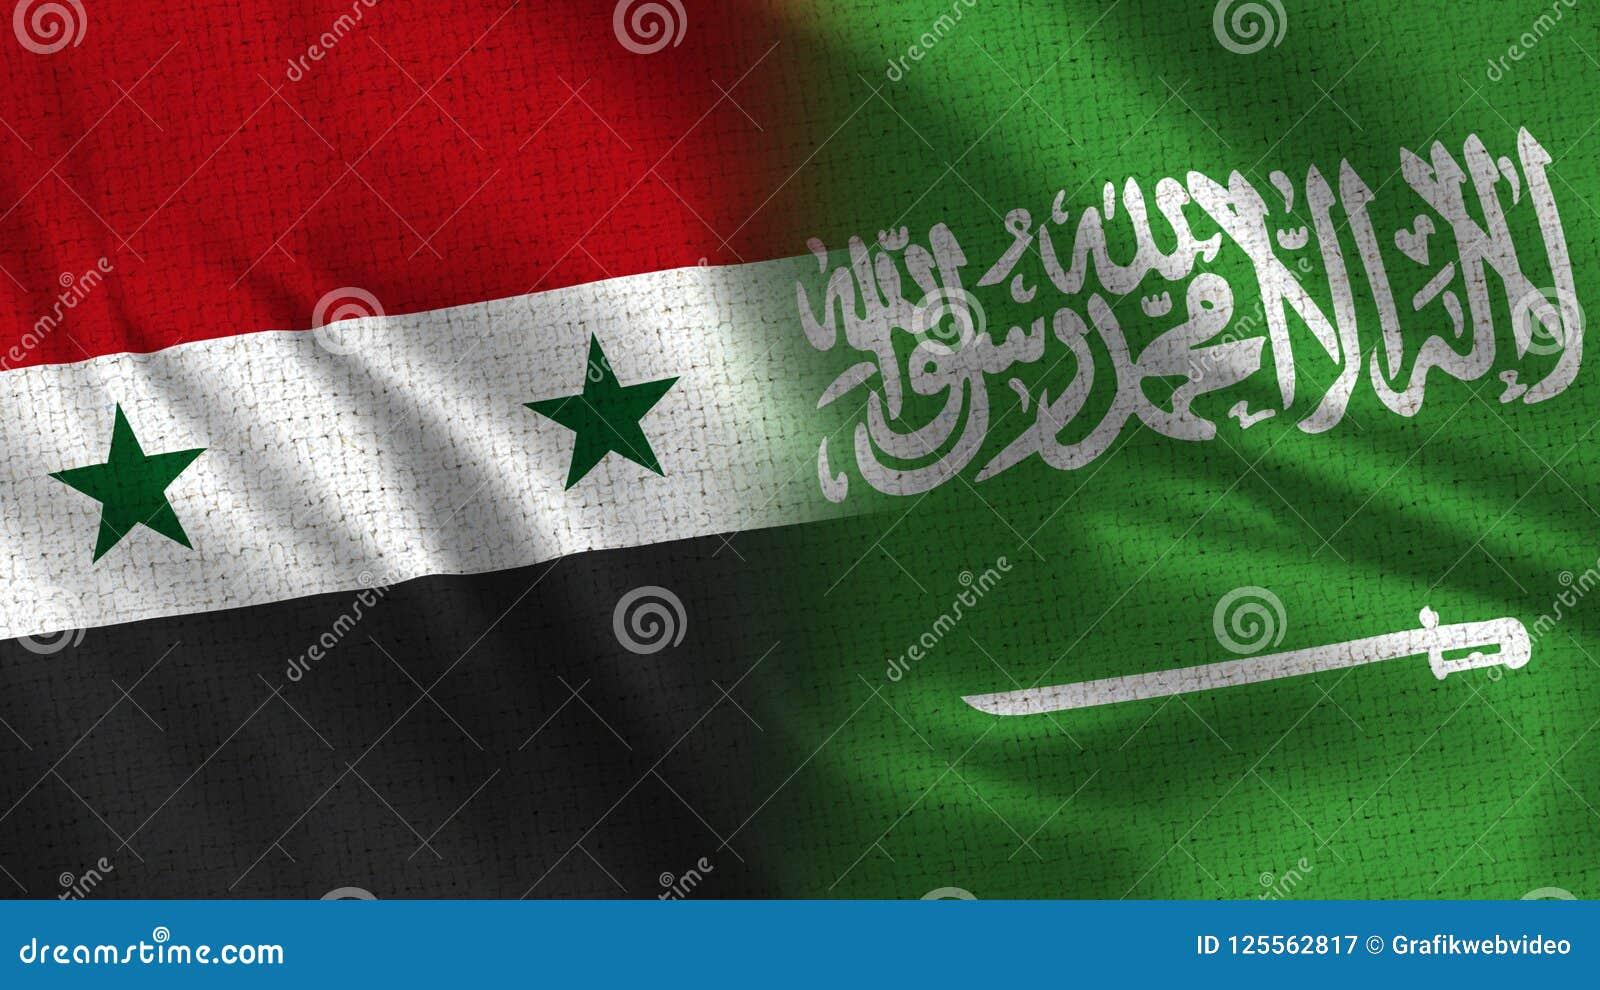 Syria And Saudi Arabia Two Half Flags Together Stock Image Image